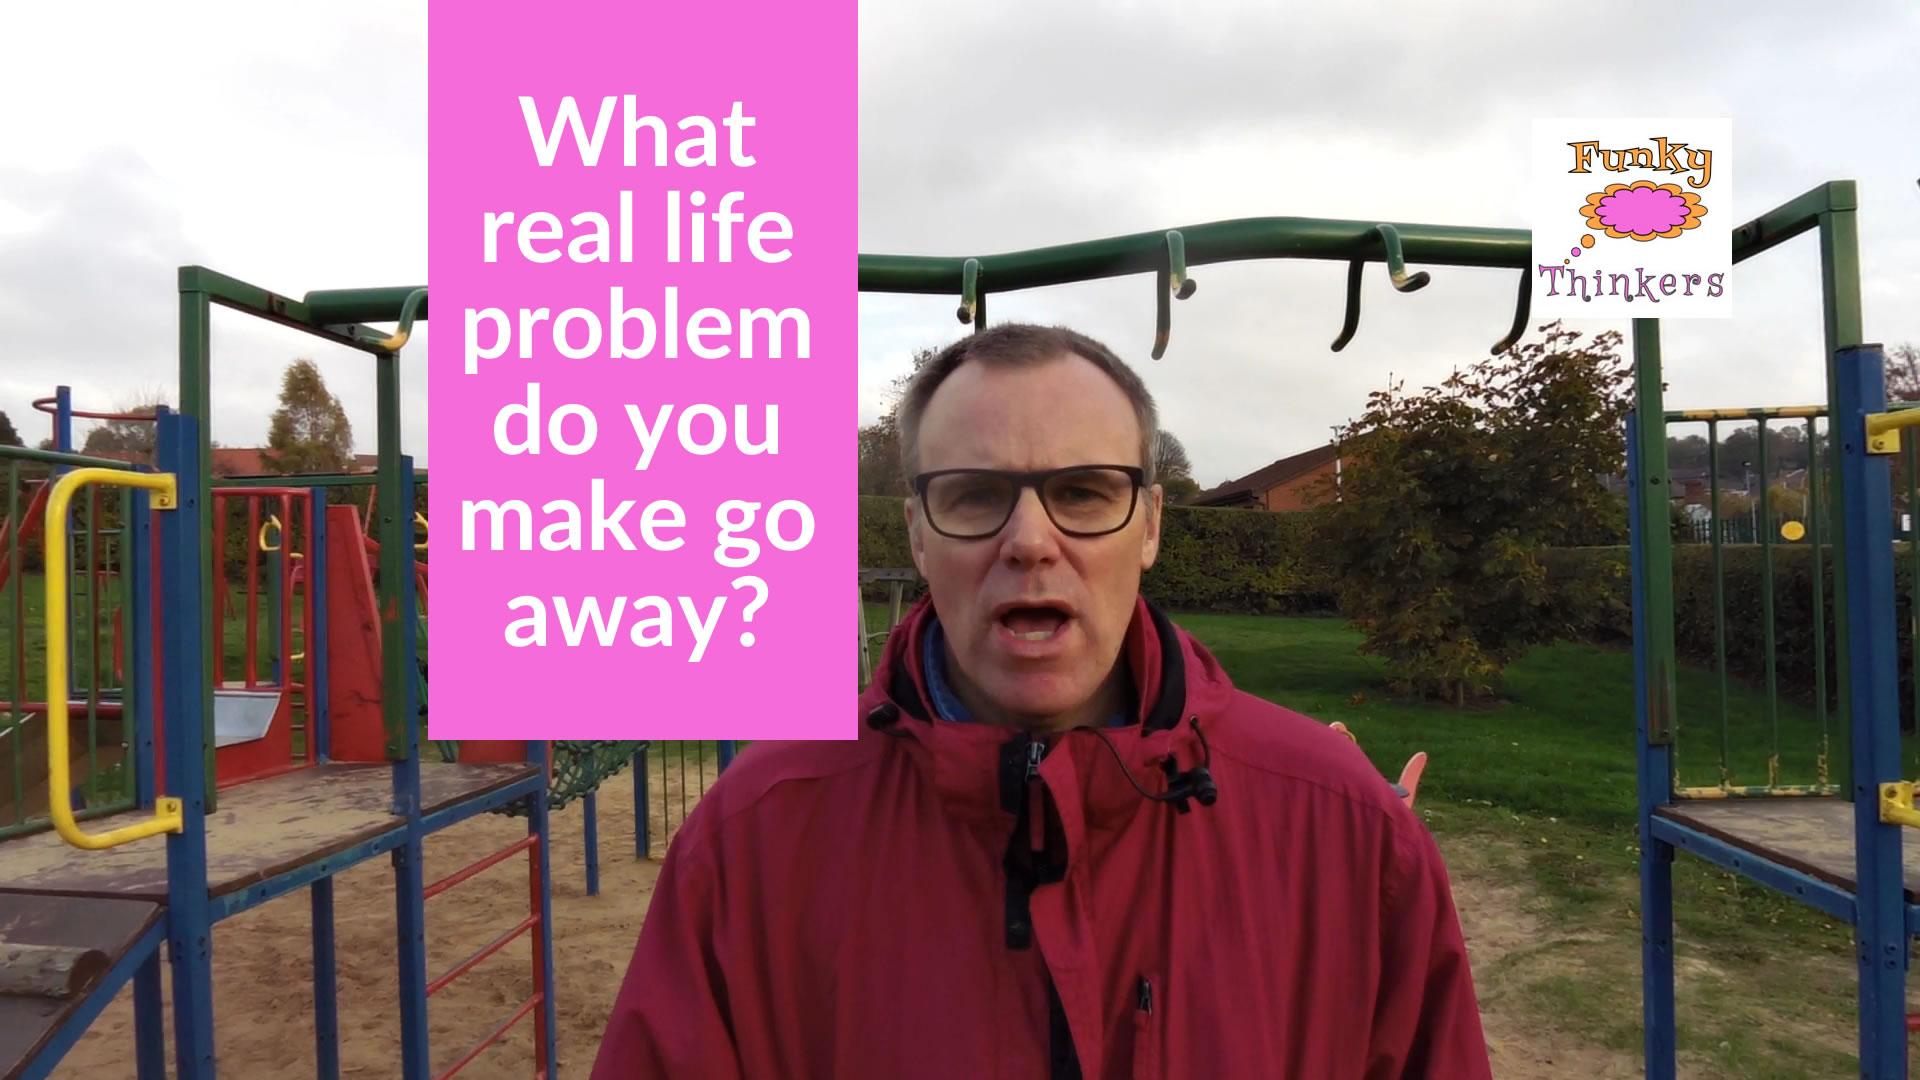 what real life problem do you make go away